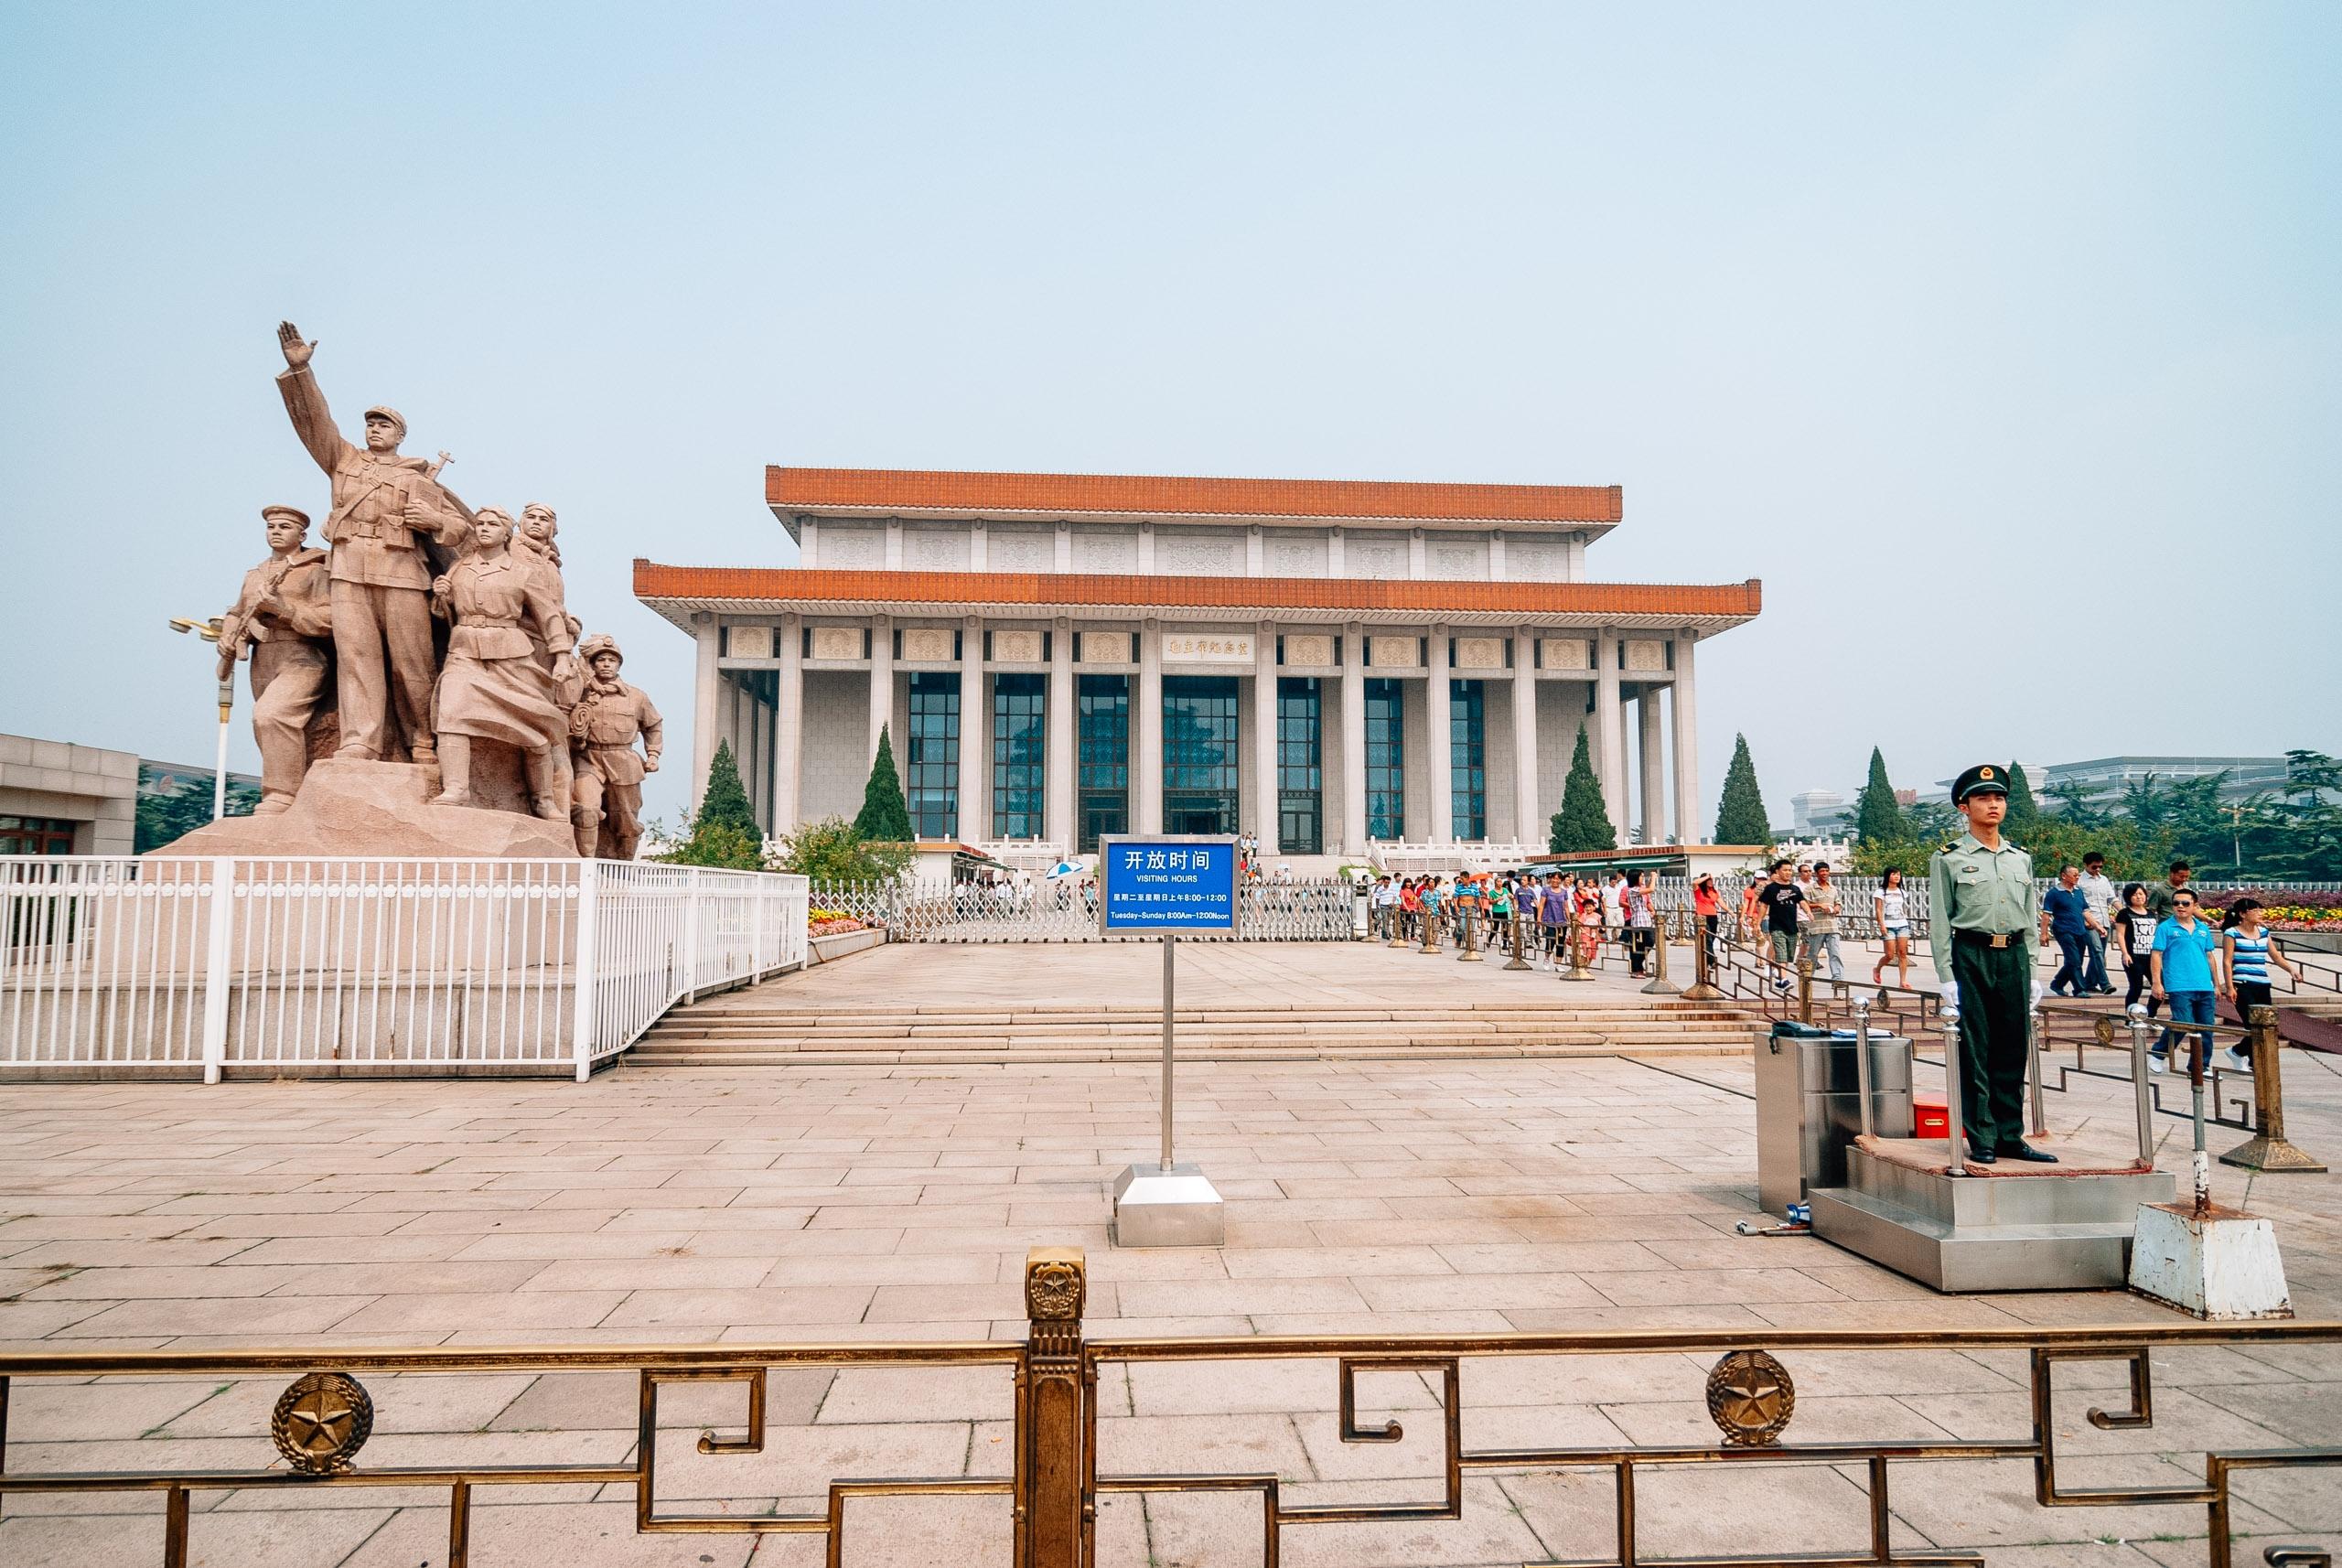 China - Beijing & The Great Wall - 2010-0903-DSC_0272_109255